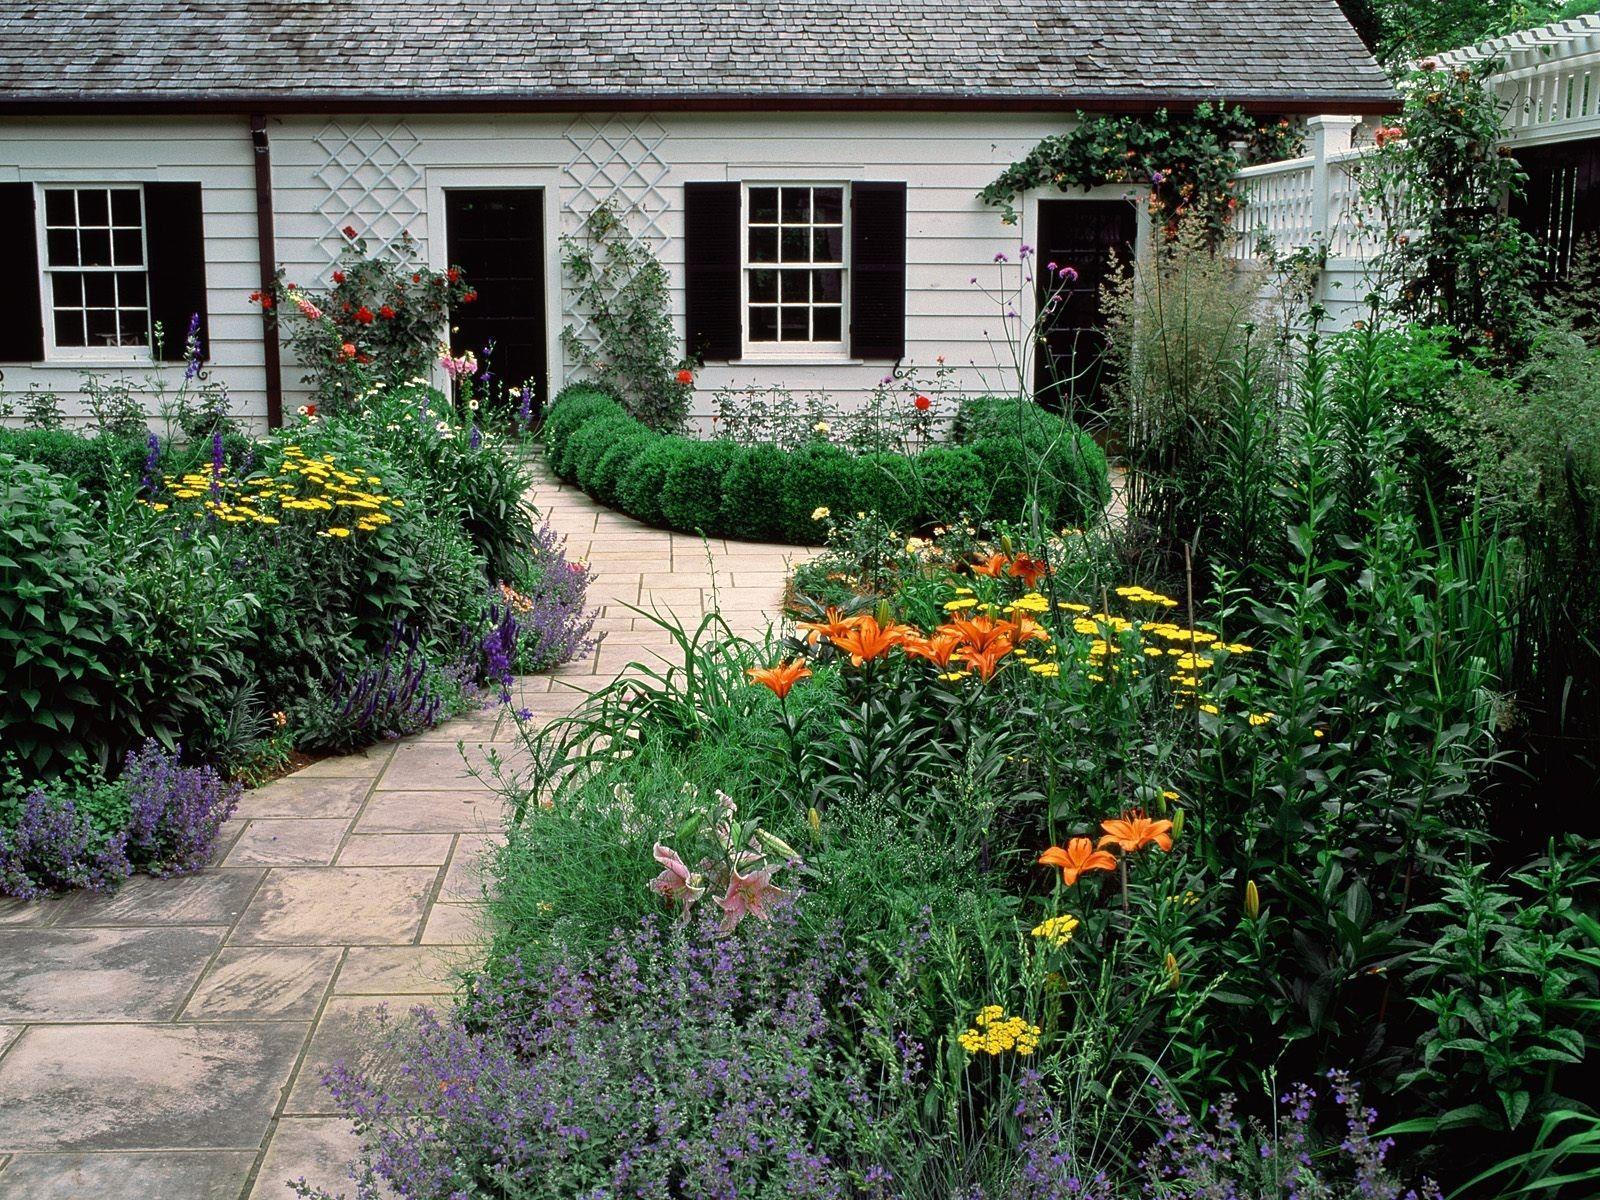 Cottage Garden Wallpapers - Top Free Cottage Garden ...